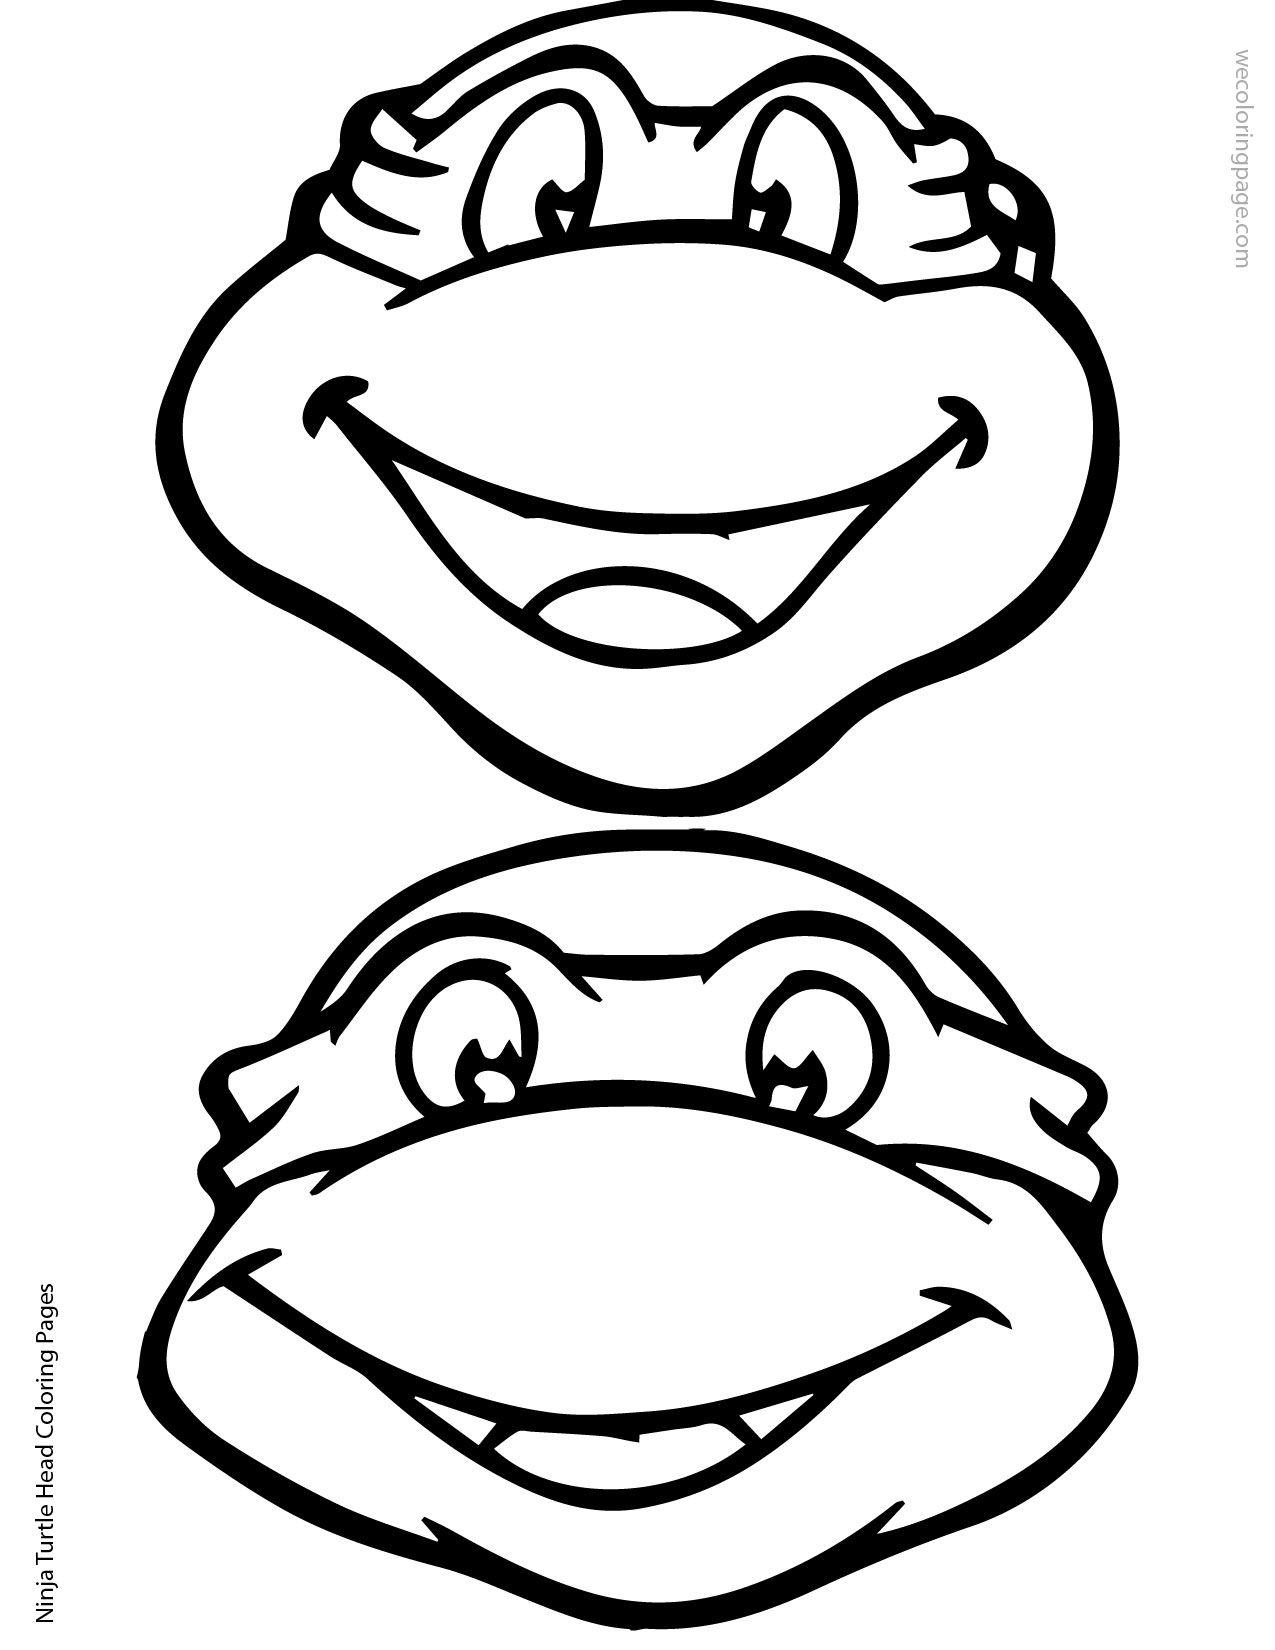 Ninja Turtle Head Coloring Page 02 01